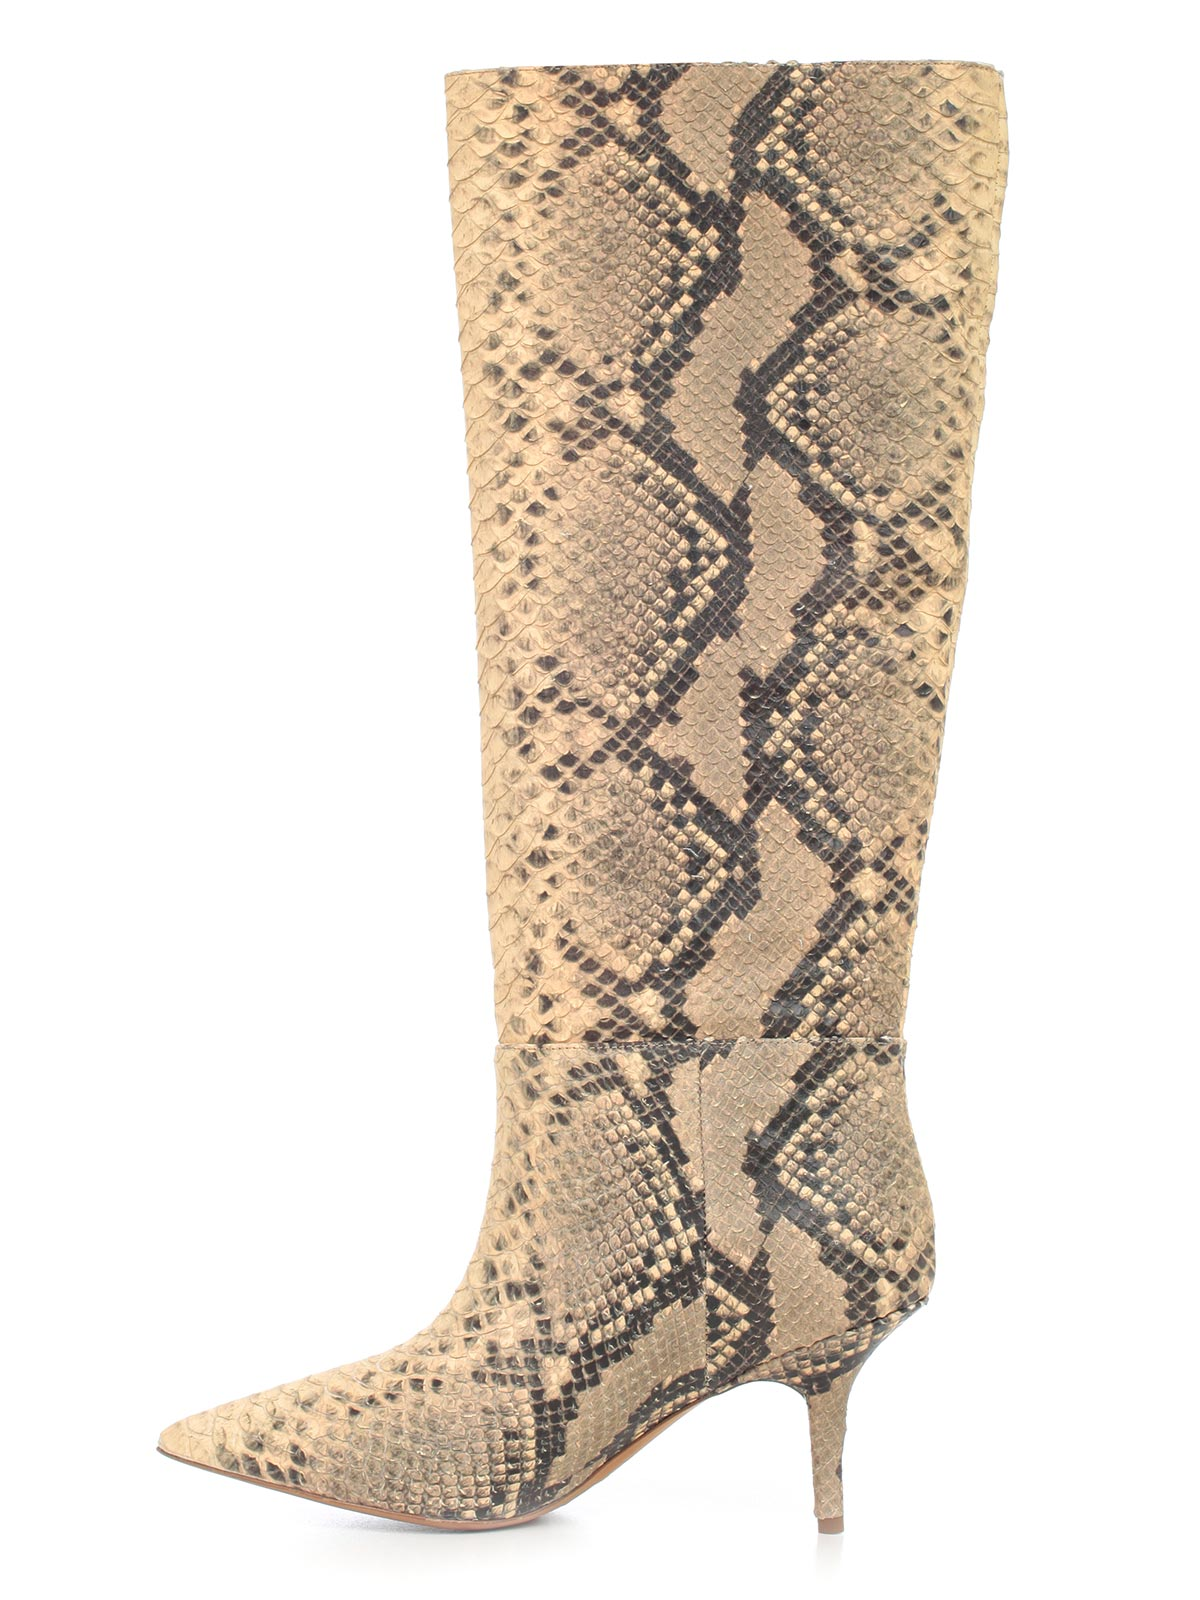 Picture of Yeezy Footwear